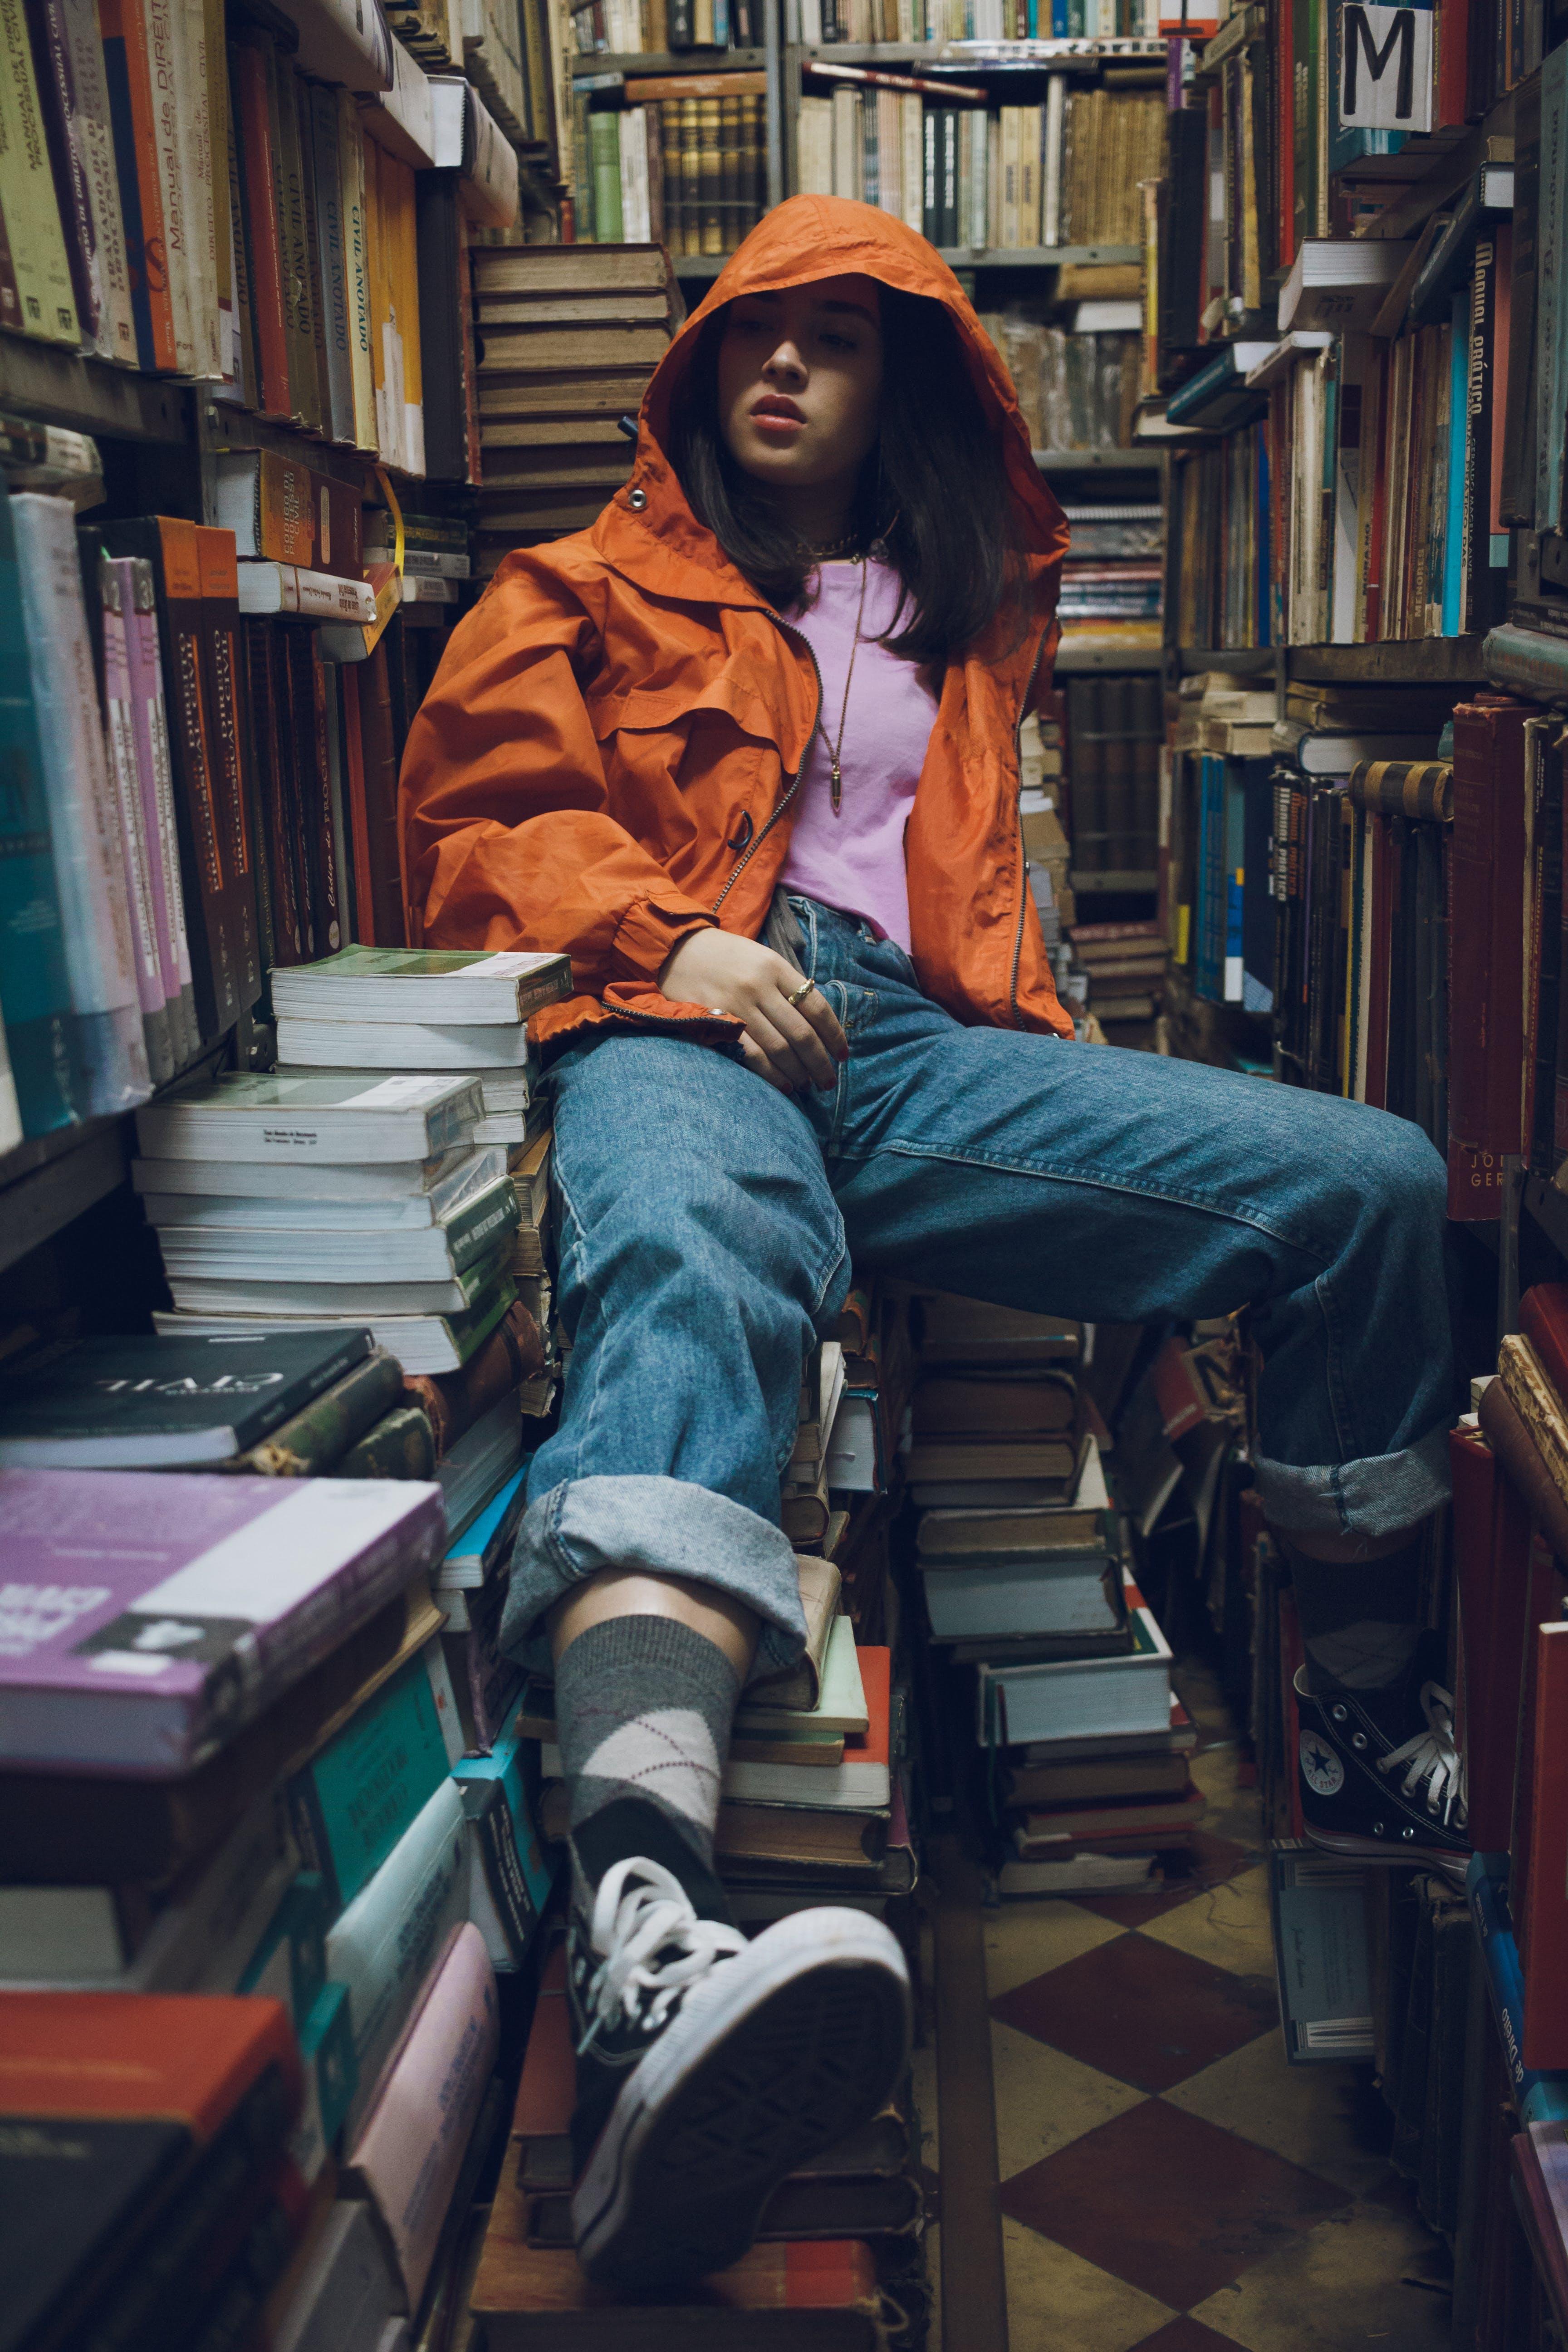 Woman Wearing Orange Jacket Sitting Inside Library